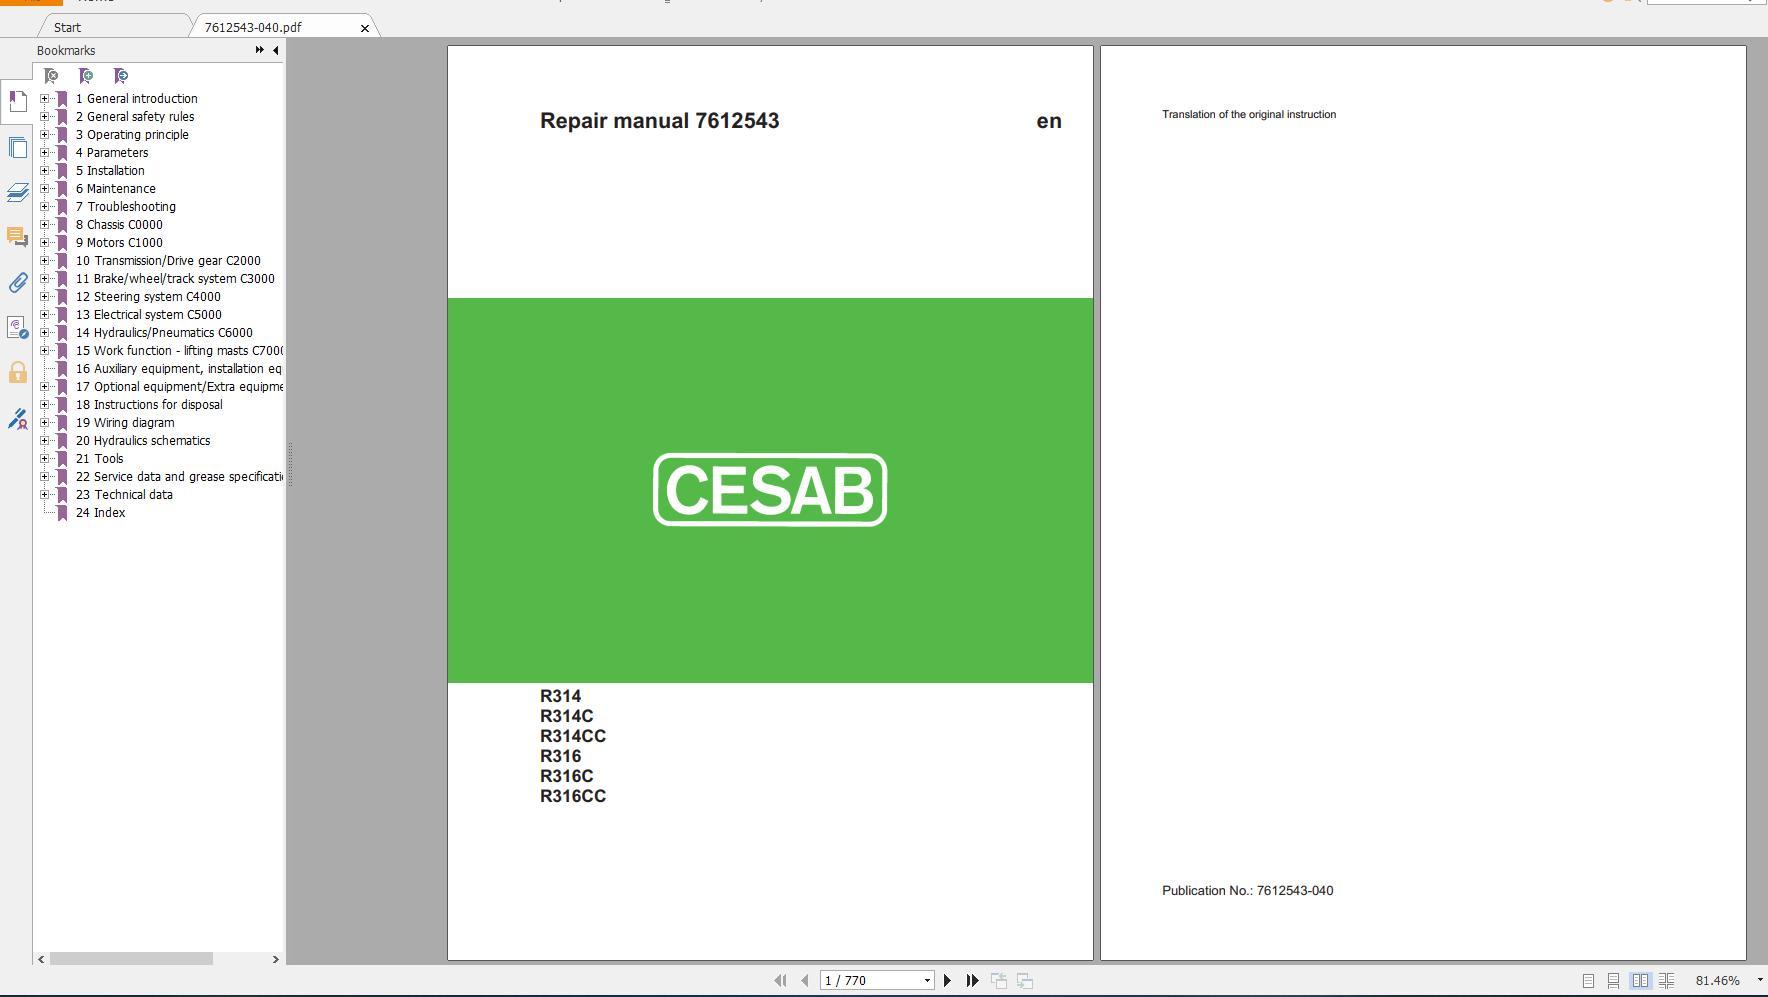 CESAB_PARTS_AND_SERVICEMANUAL_28GB_DVD_PDF0